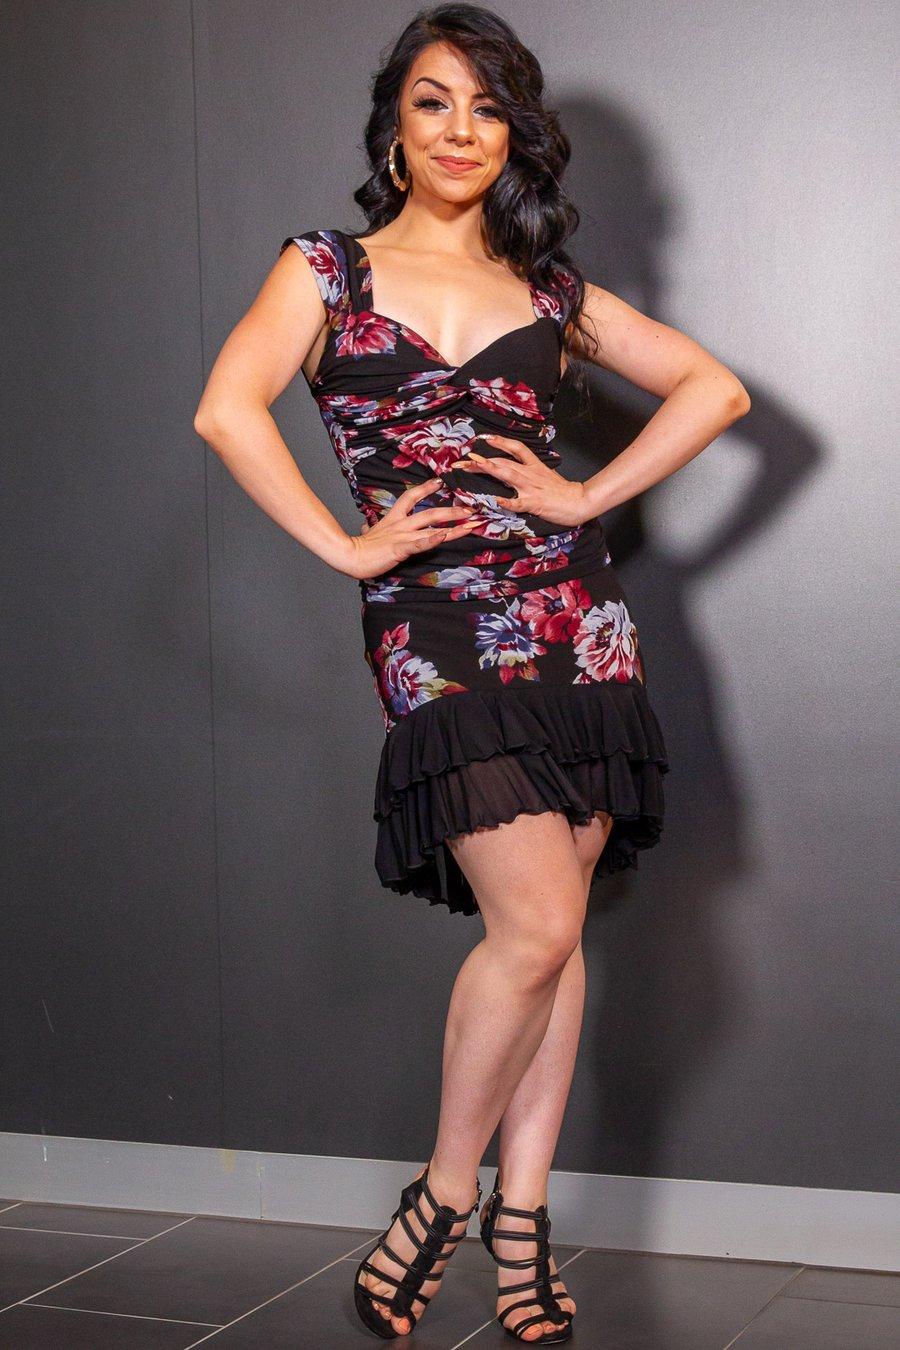 Image of Frill Skirt (J6665) Camellia Dancewear latin ballroom